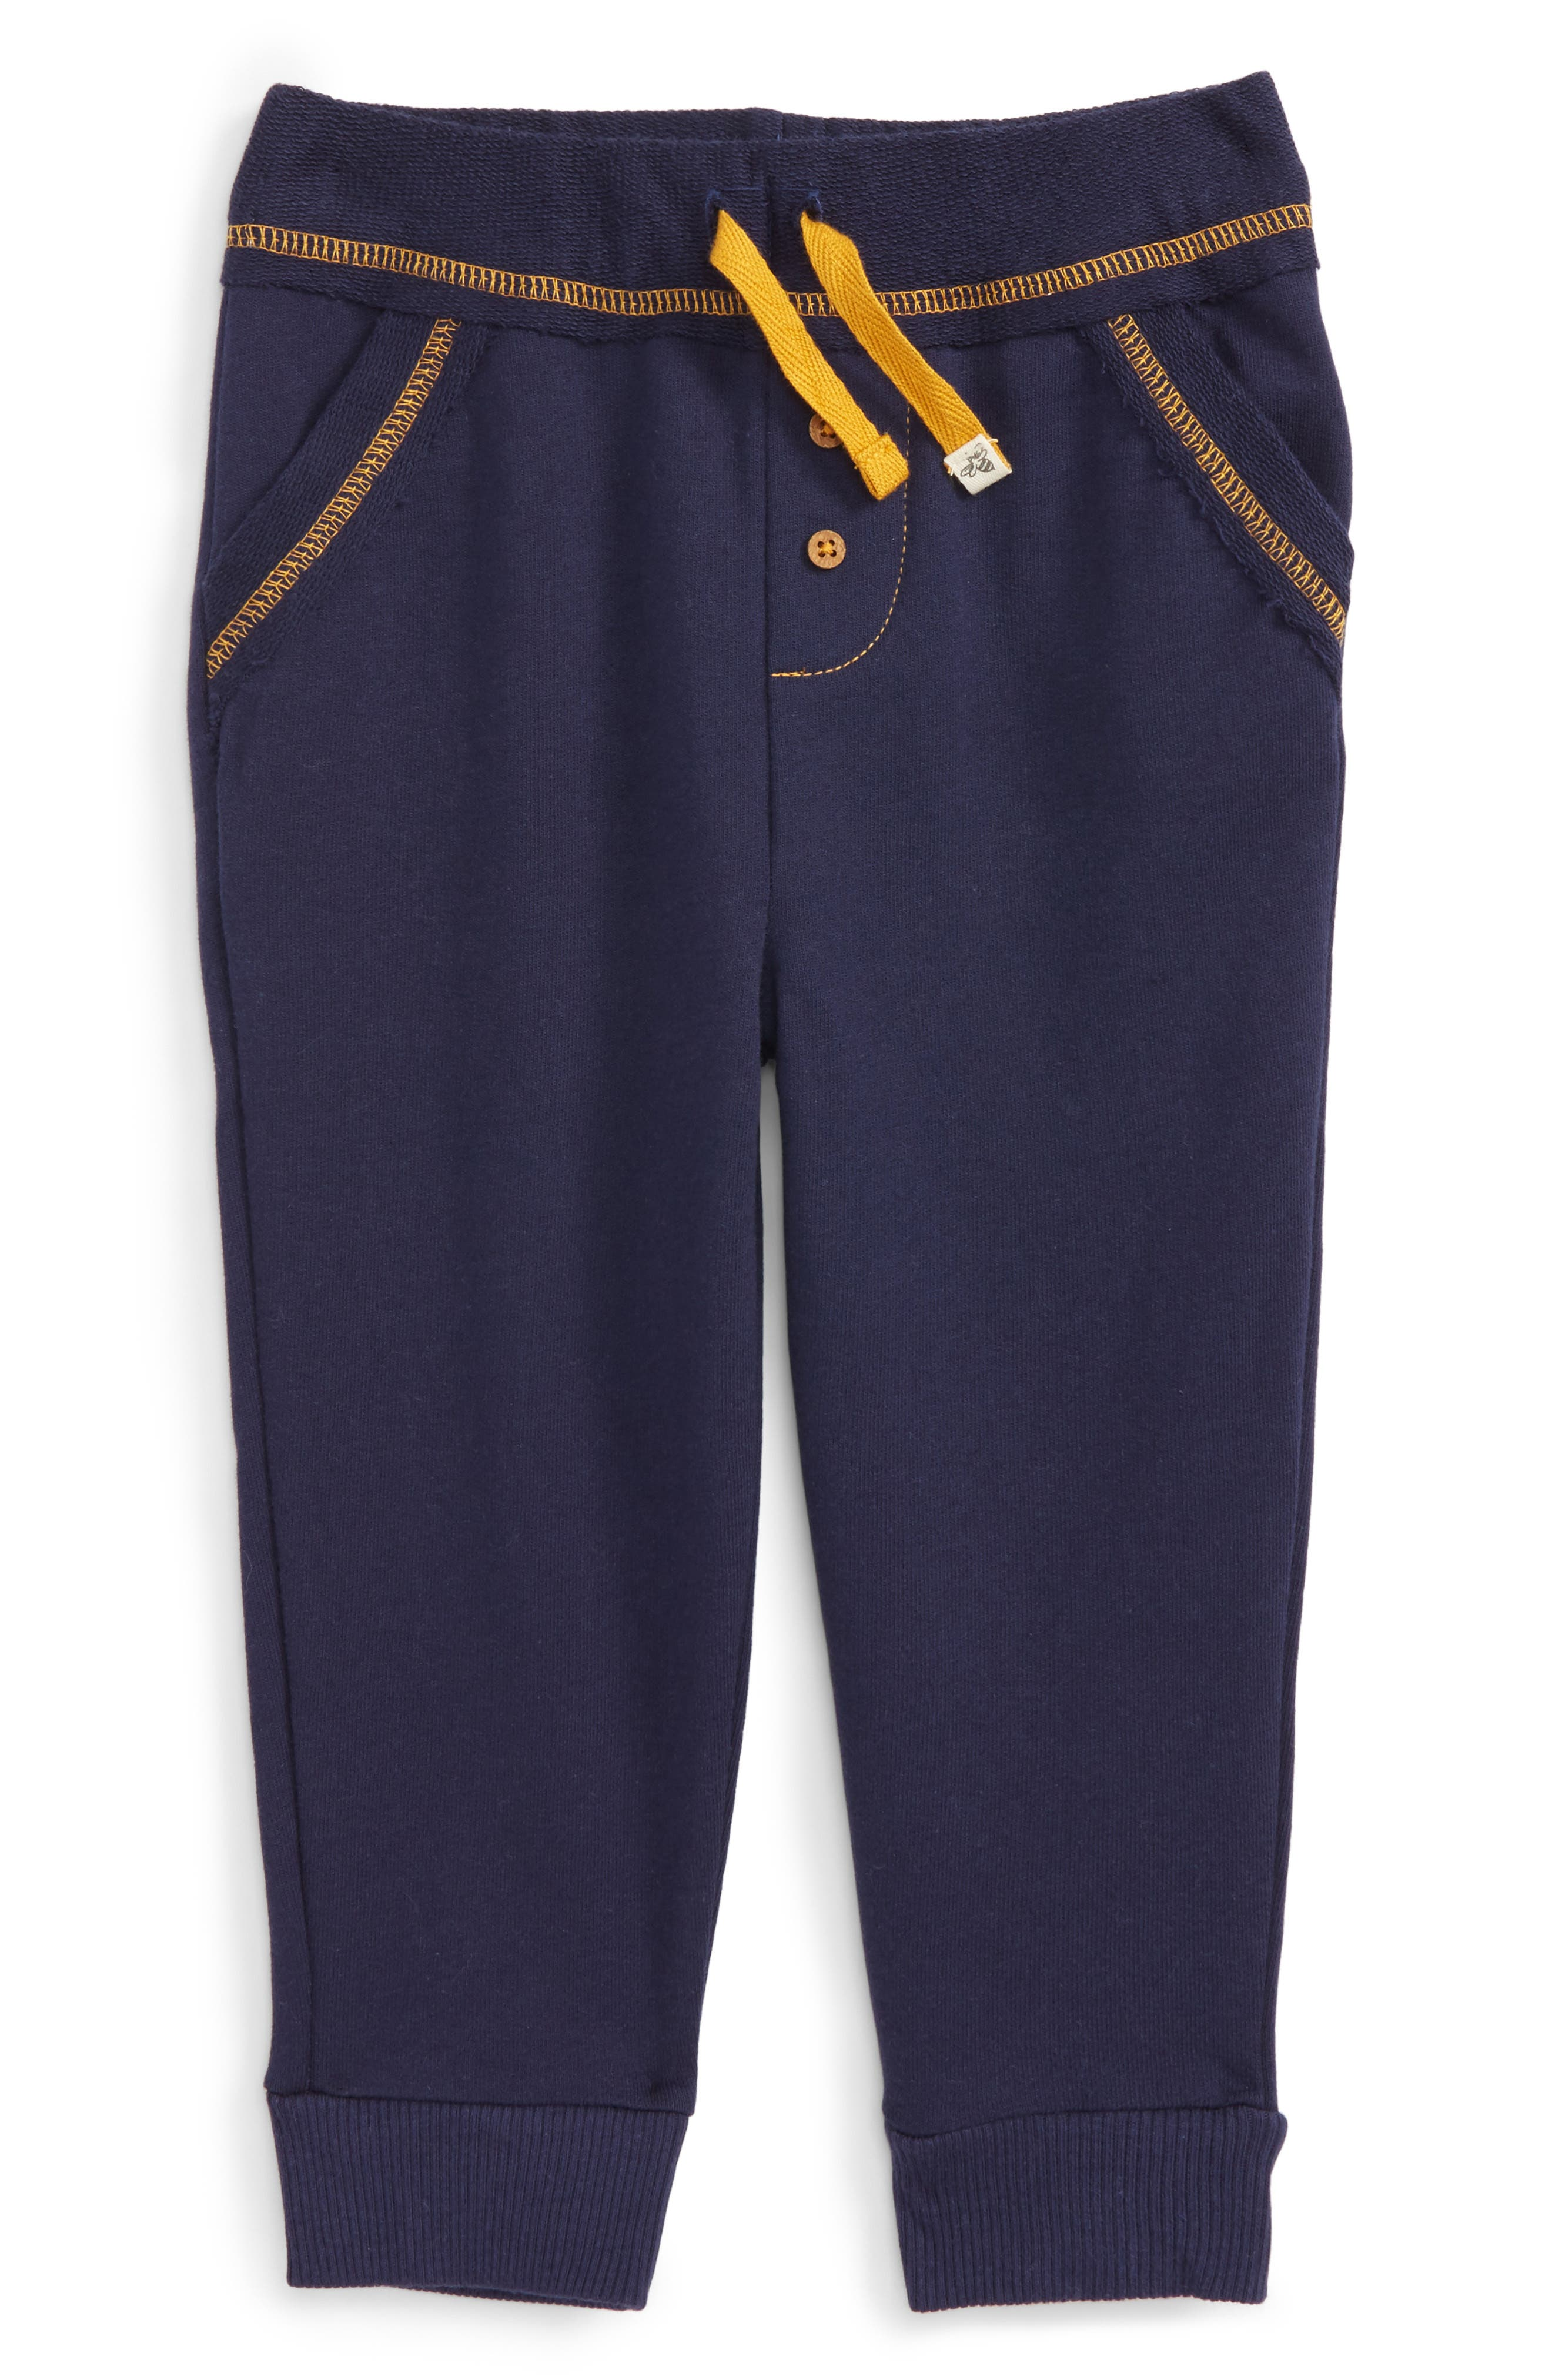 Burt's Bees Baby Reverse Waist Pants (Baby Boys)